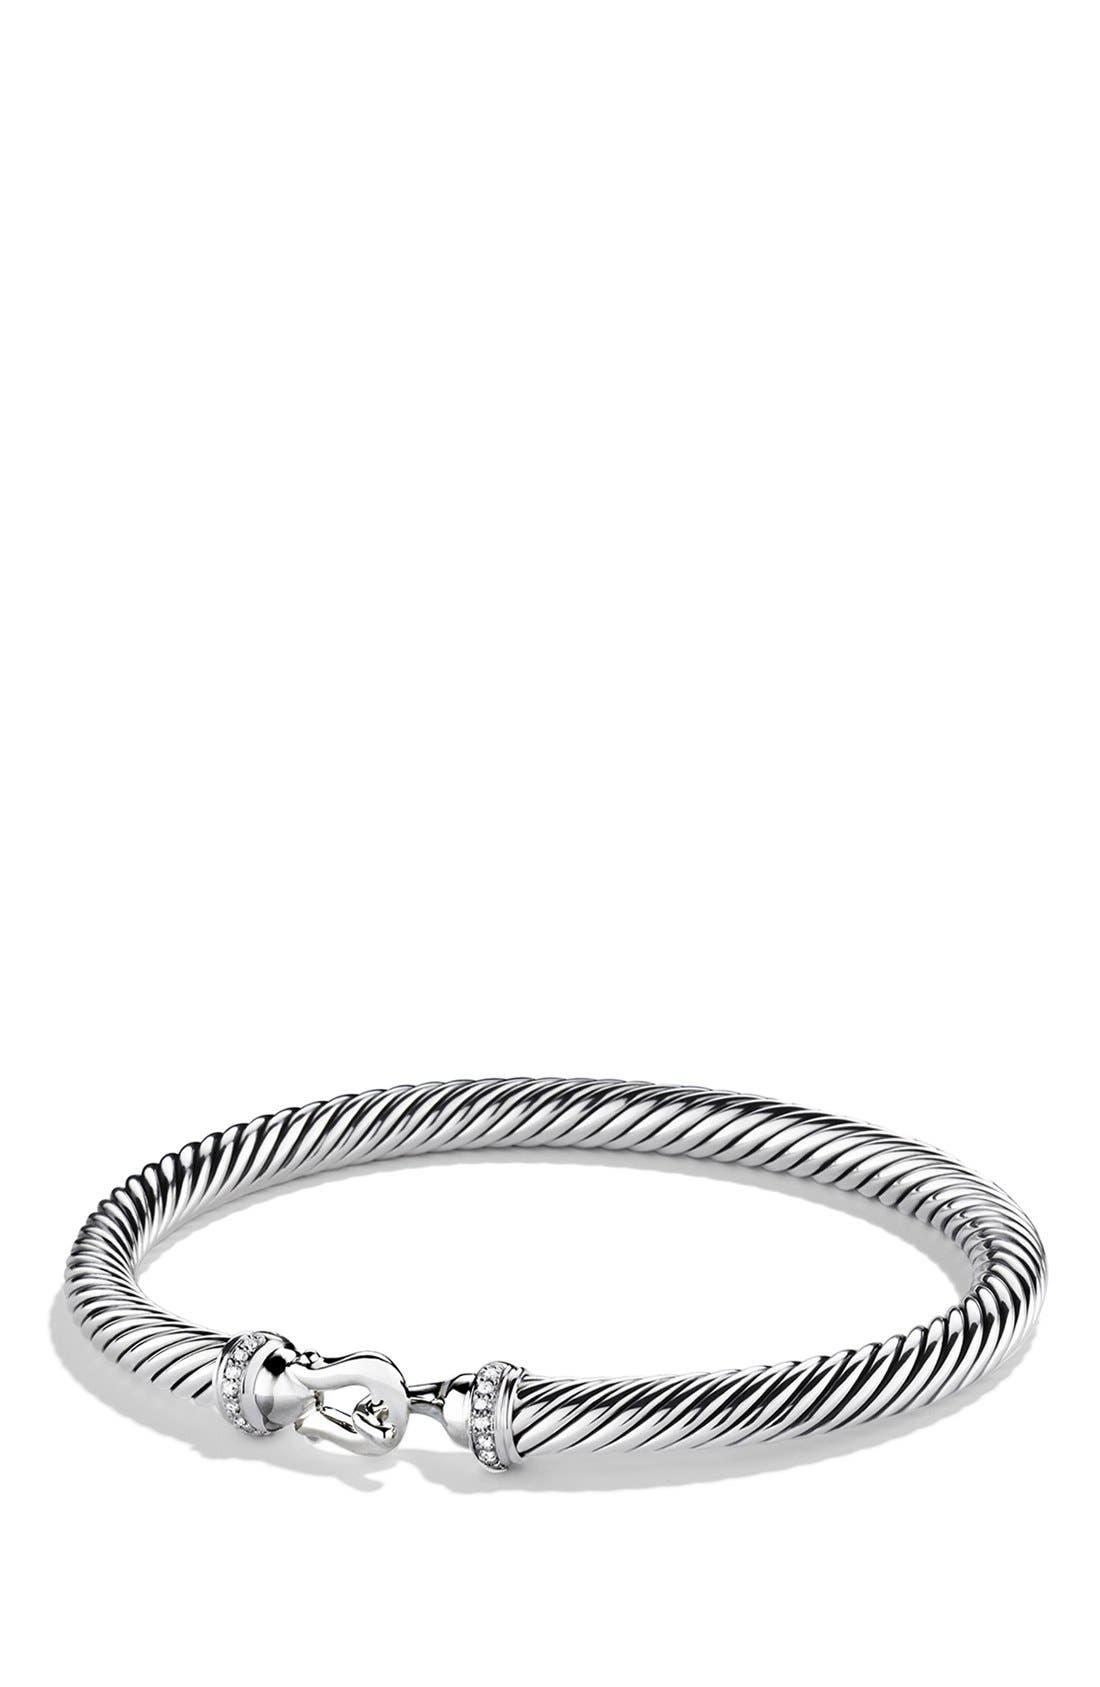 David Yurman 'Cable Buckle' Bracelet with Diamonds